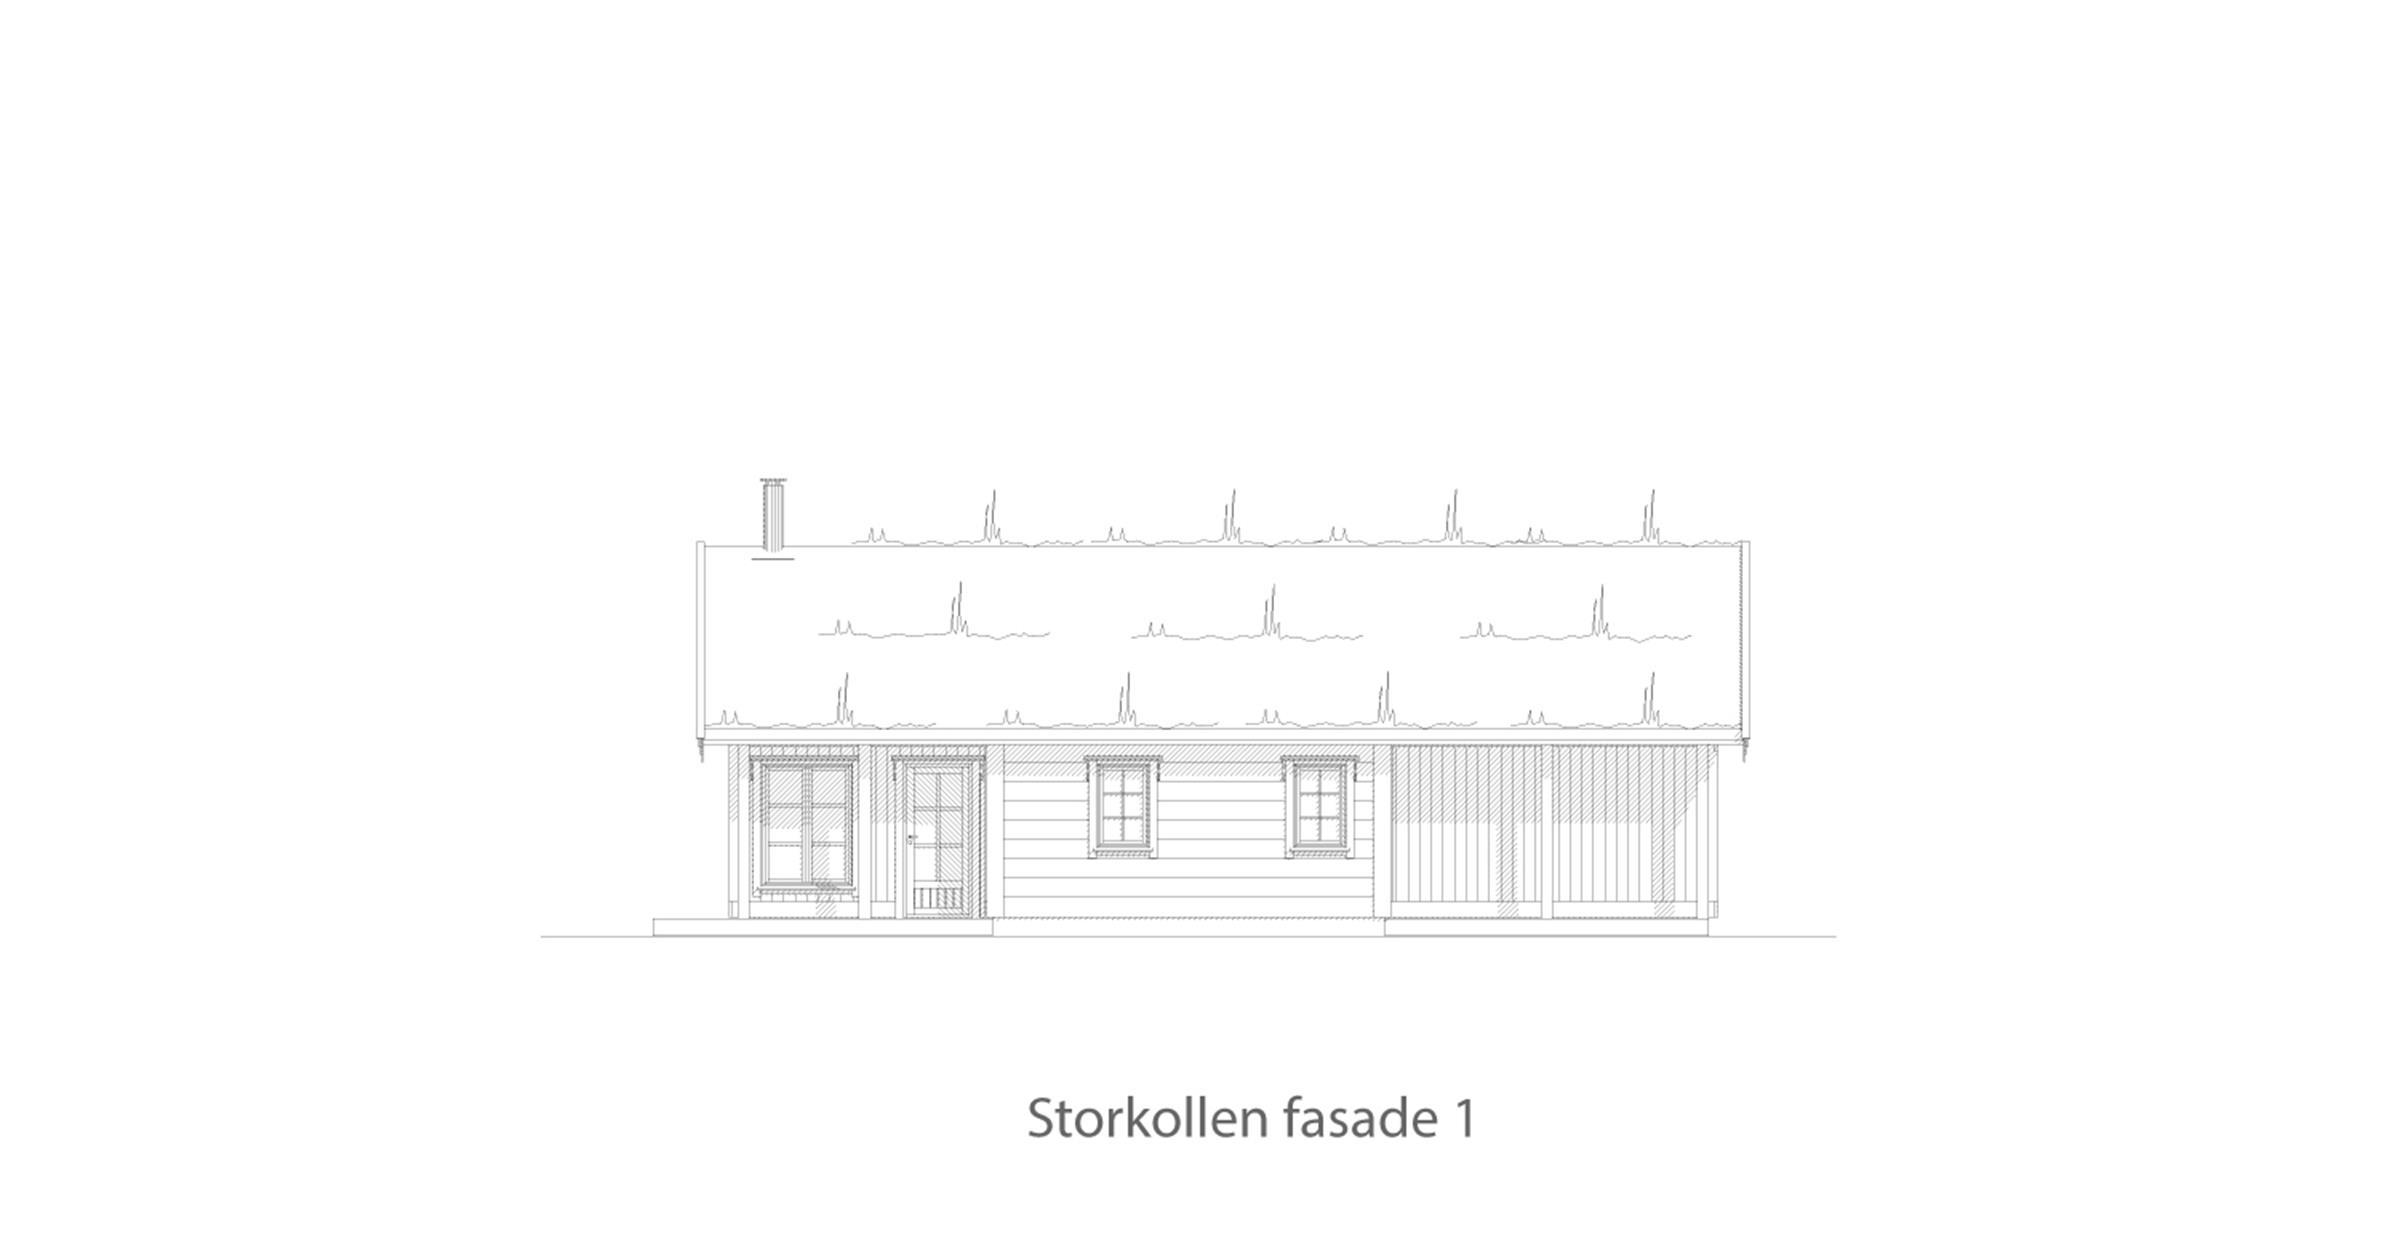 Storkollen fasade 1